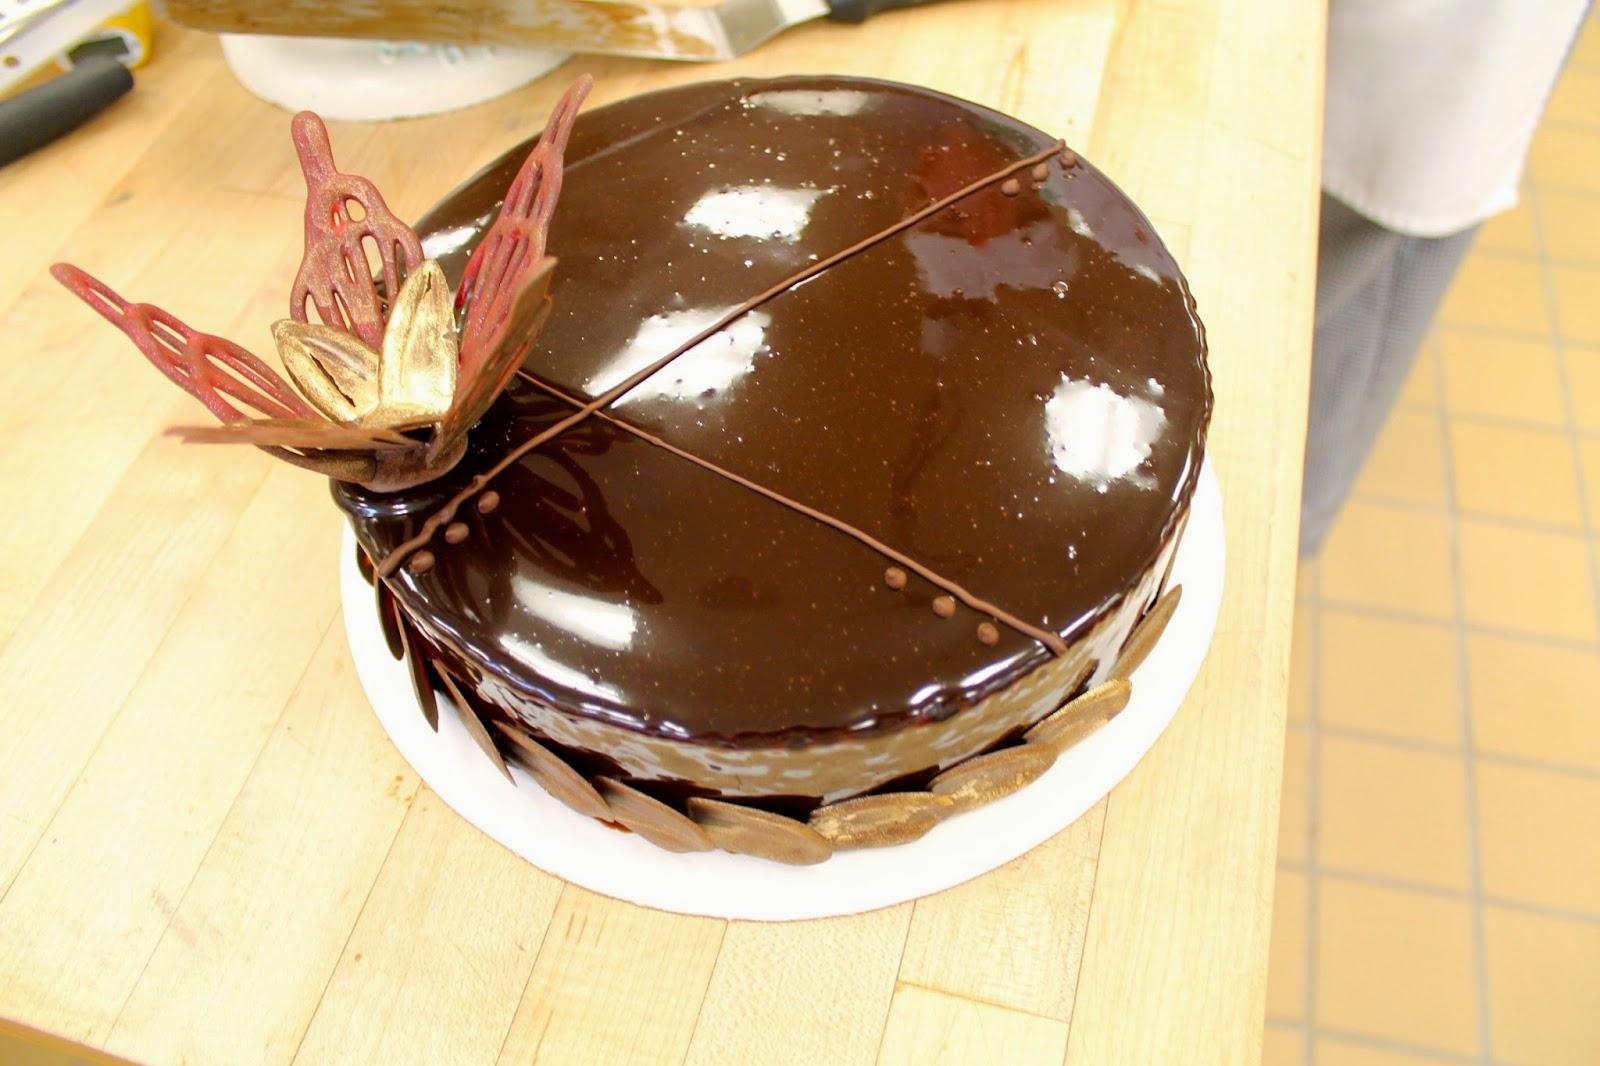 Sponge Cake With Chocolate Ganache